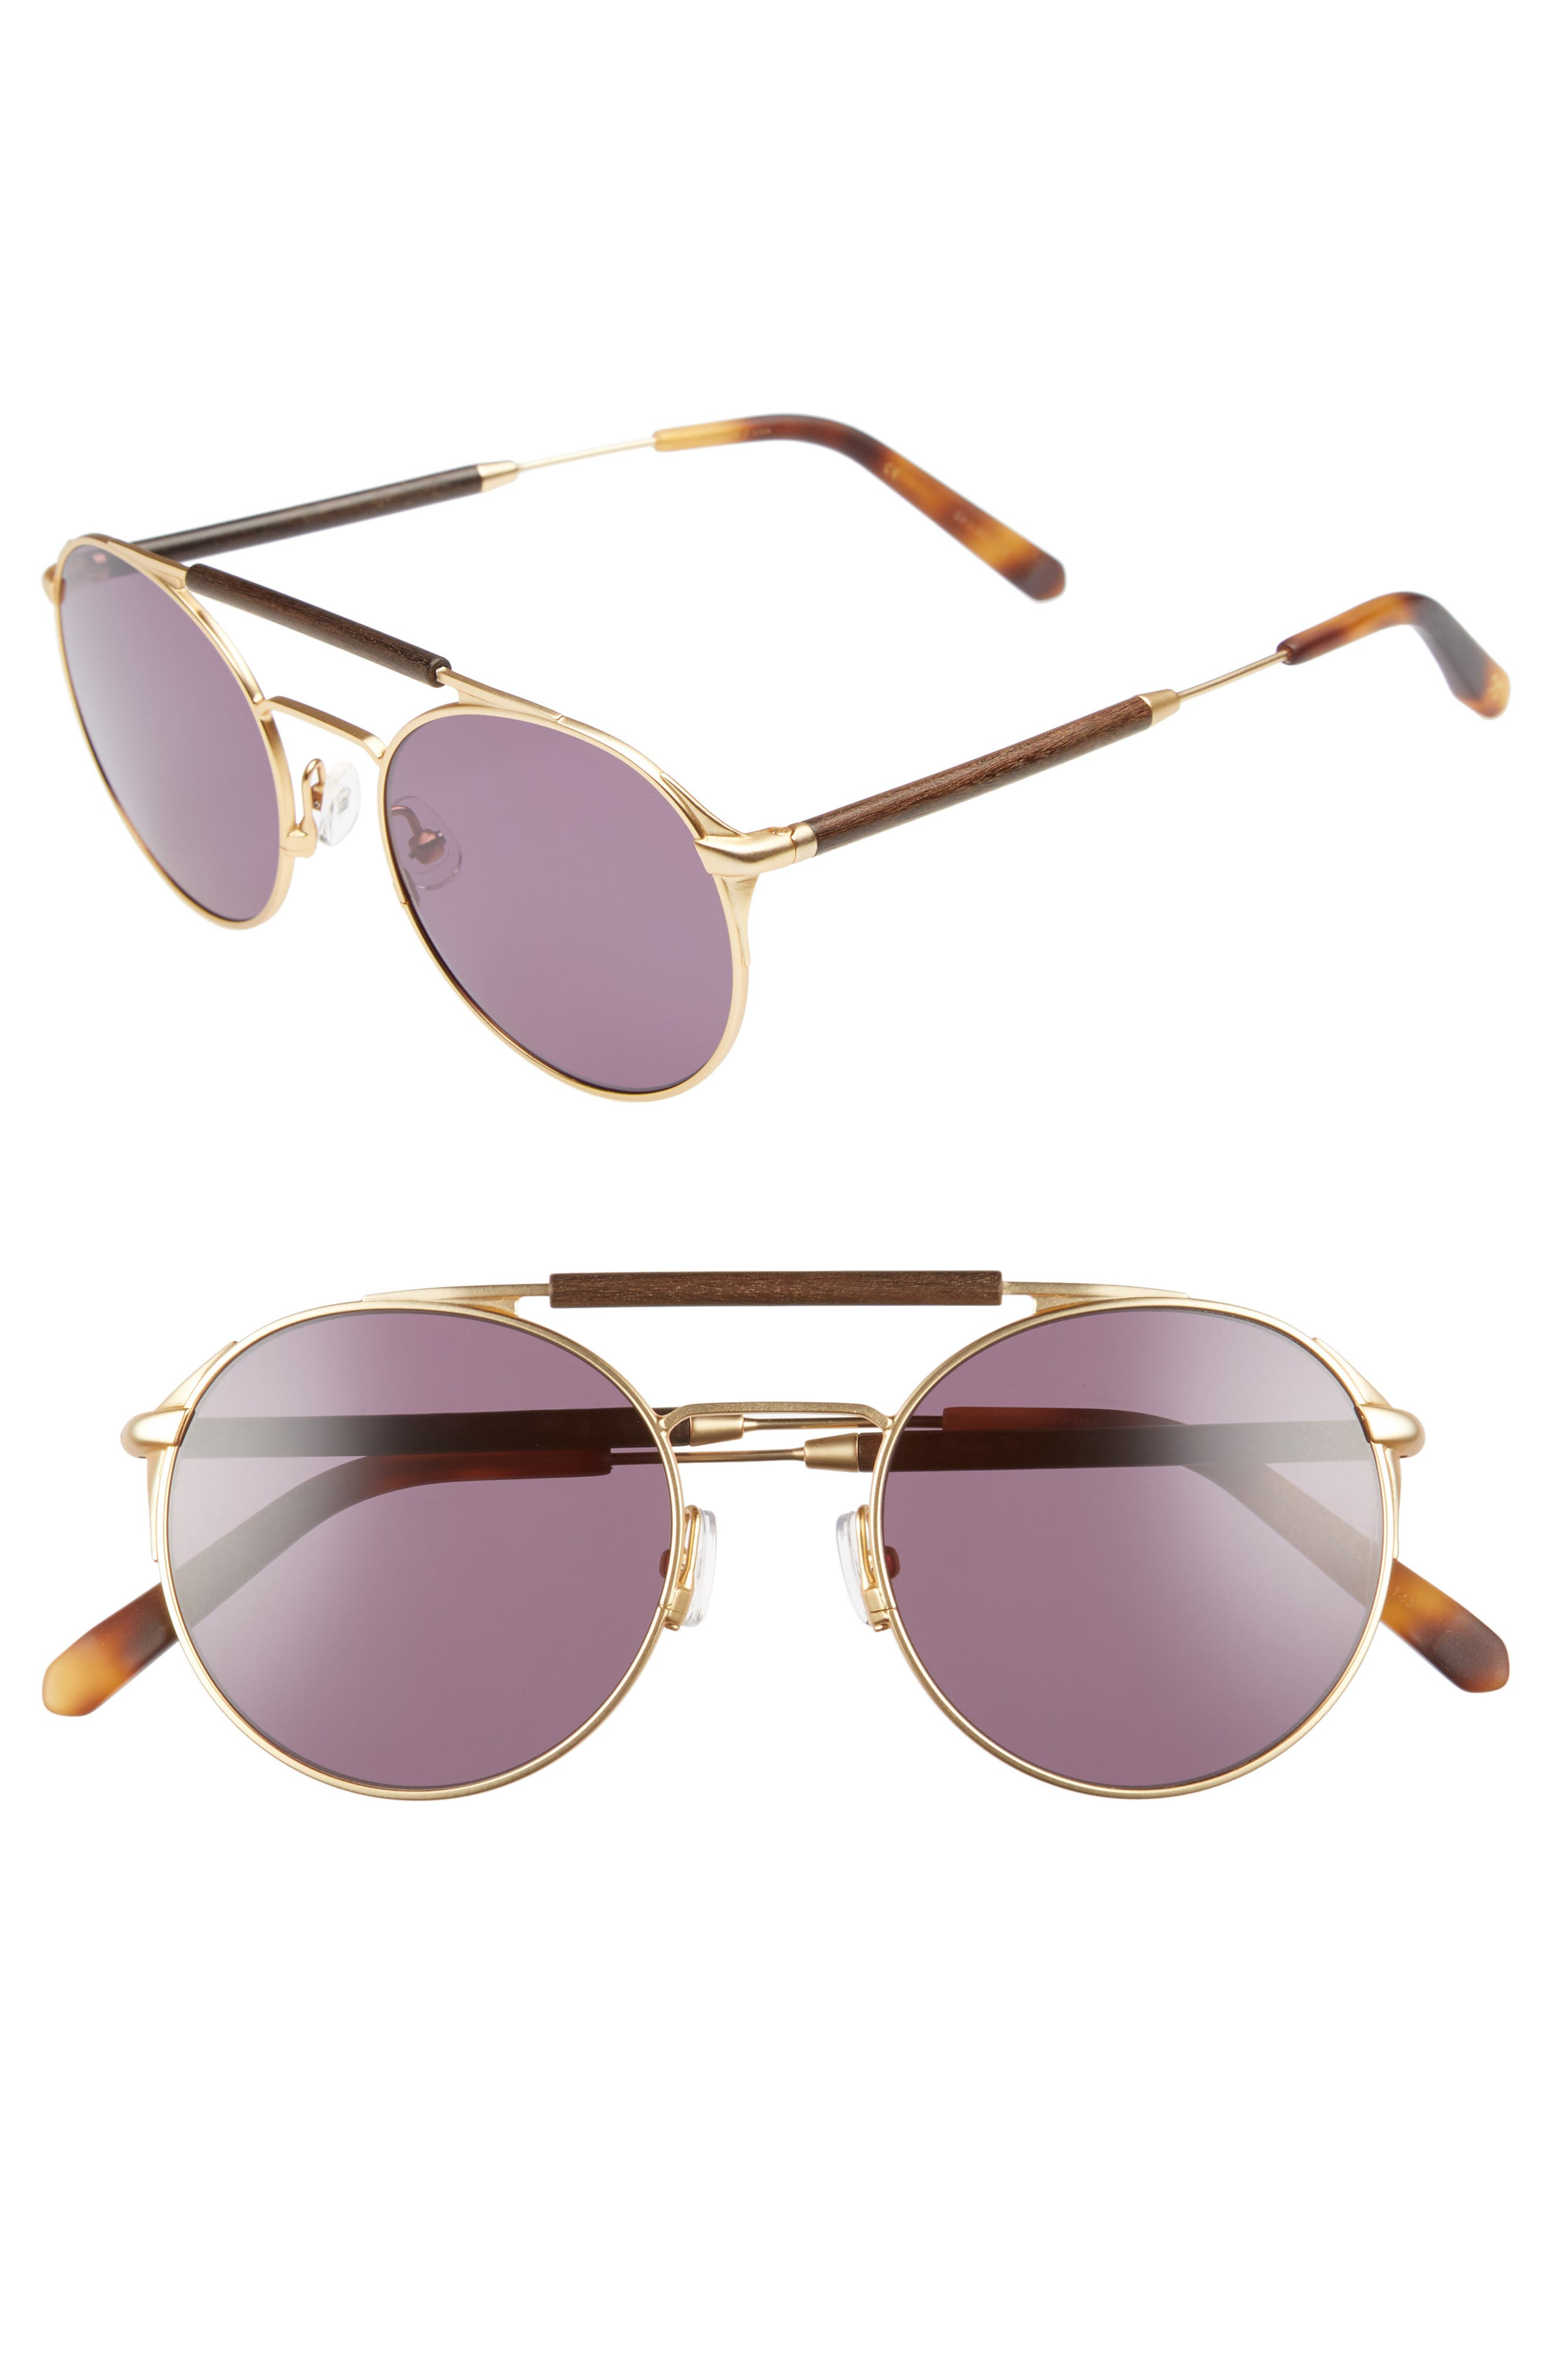 Bandon 52mm Round Sunglasses,                         Main,                         color, Matte Gold/ Walnut/ Grey